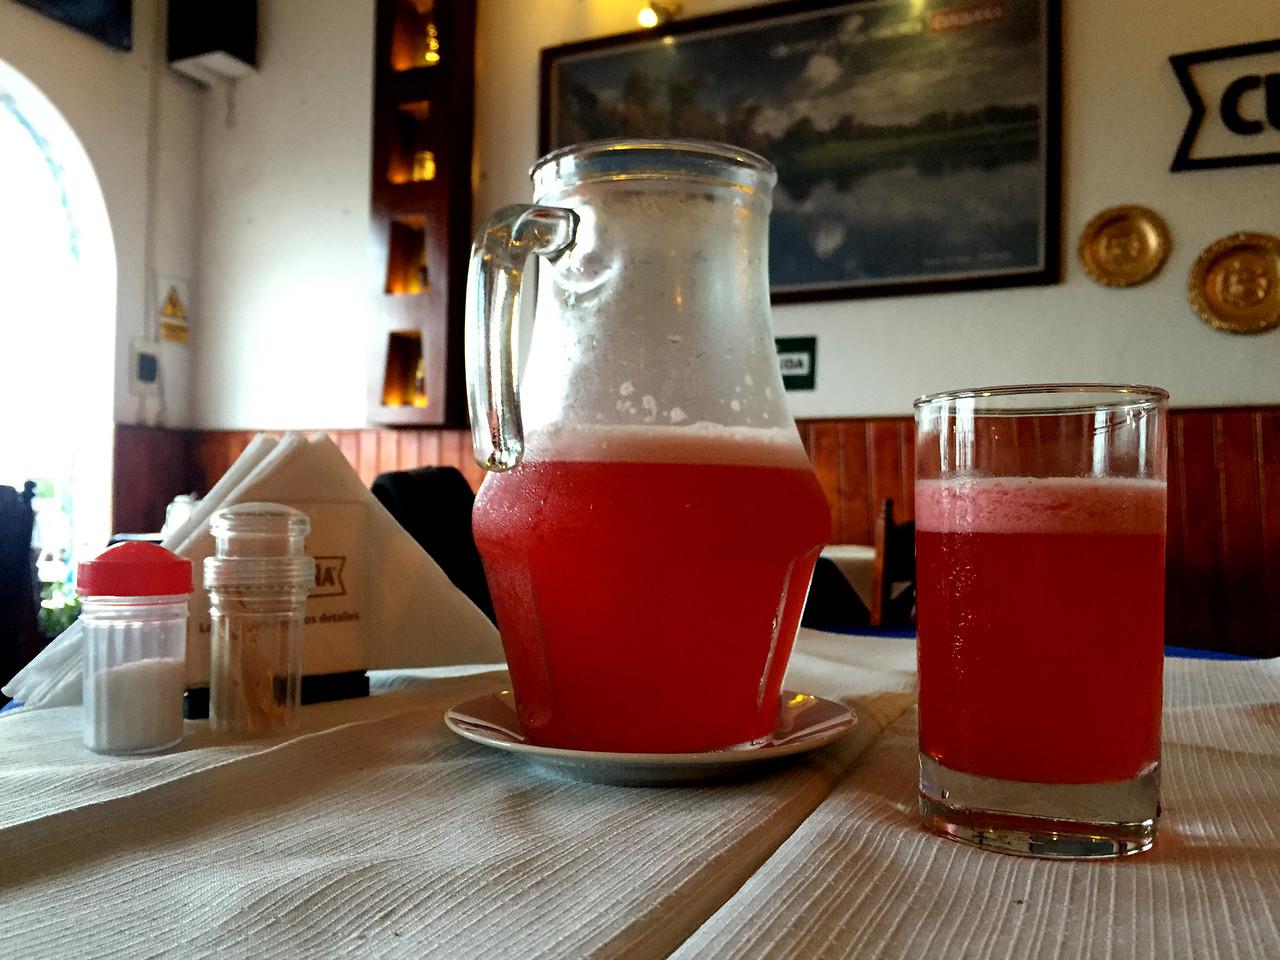 Jar of chilled kamu kamu juice, the famous citric fruit of the Amazon rainforest